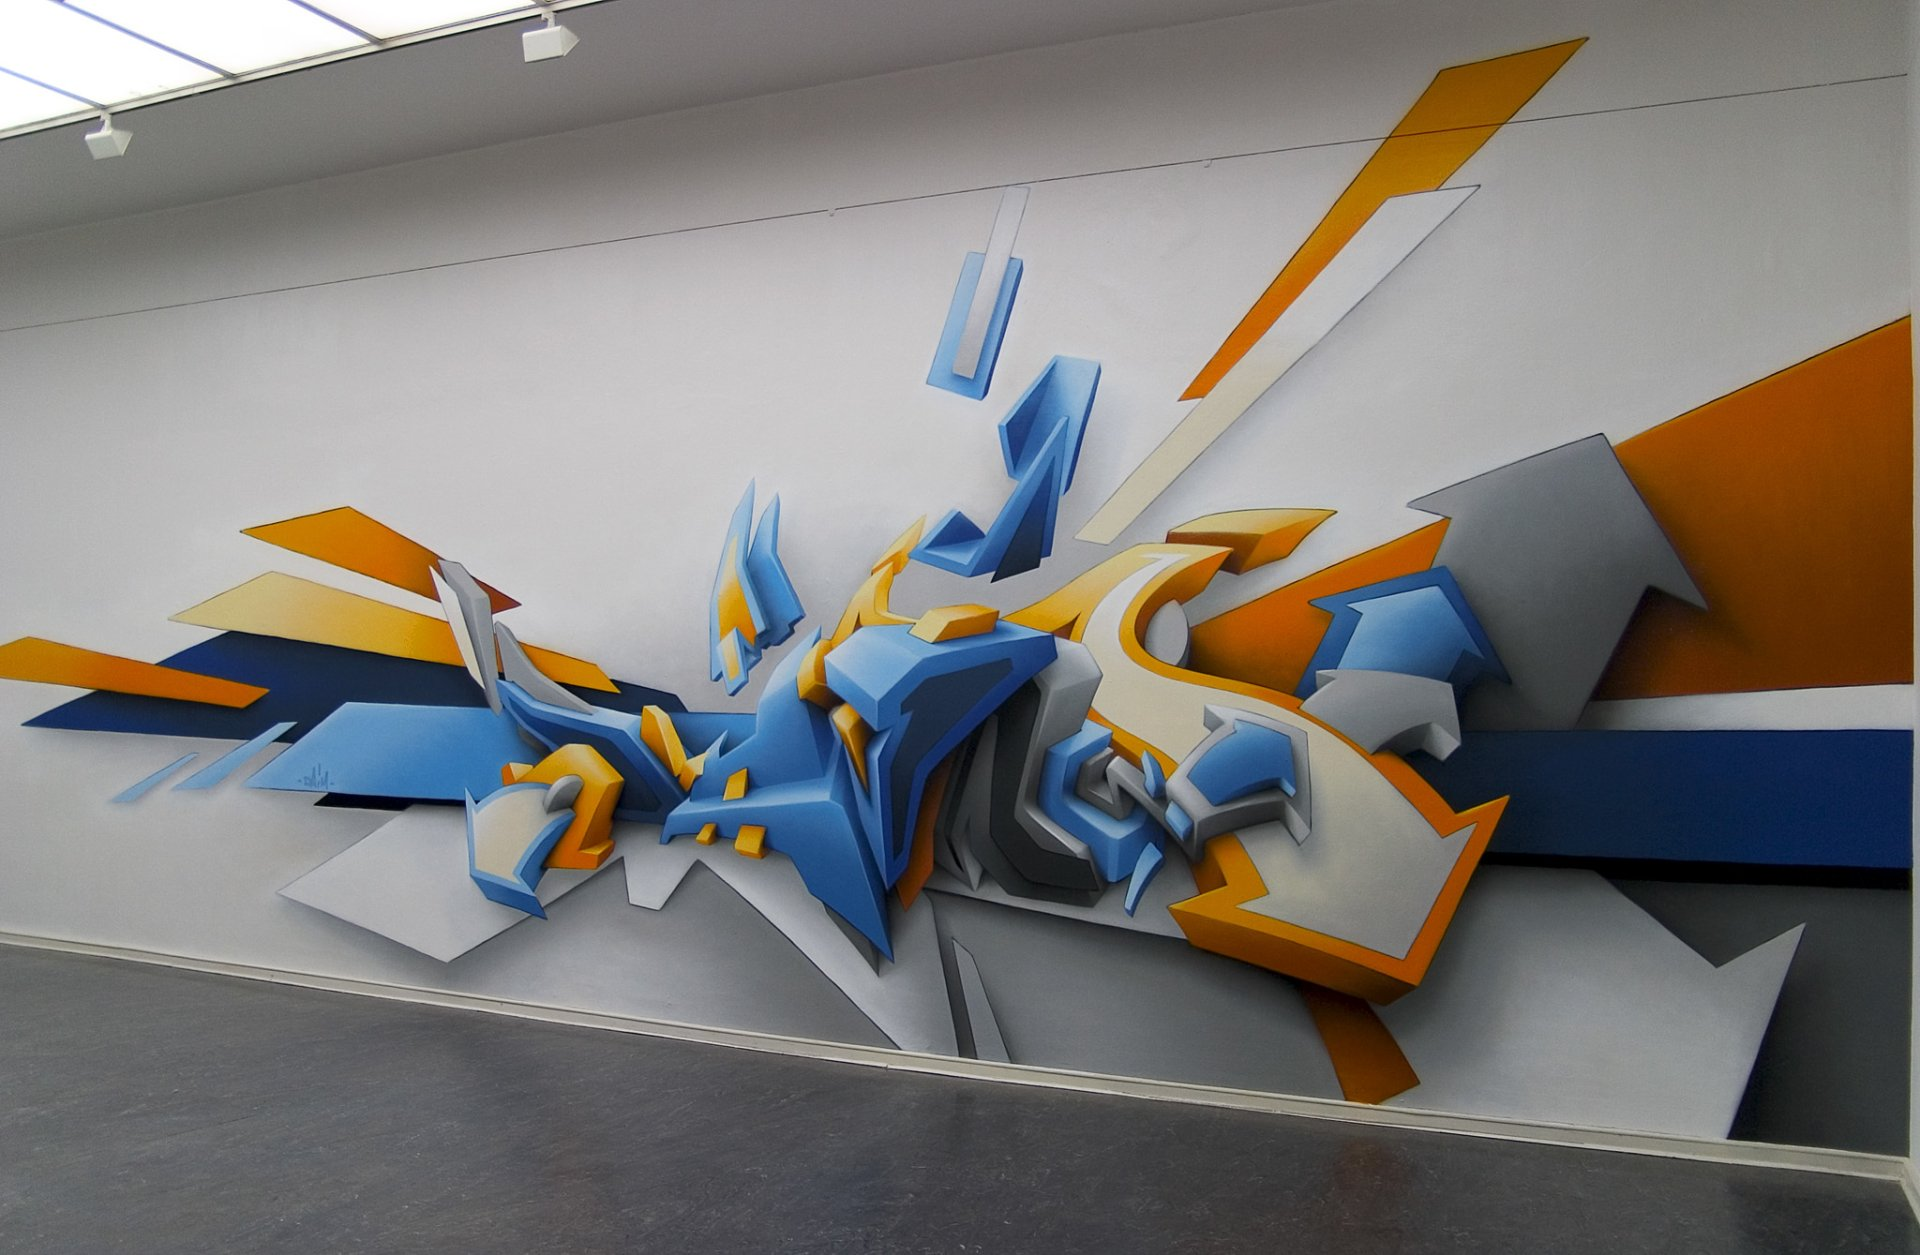 Artistic - Graffiti  Artistic Wall Wallpaper